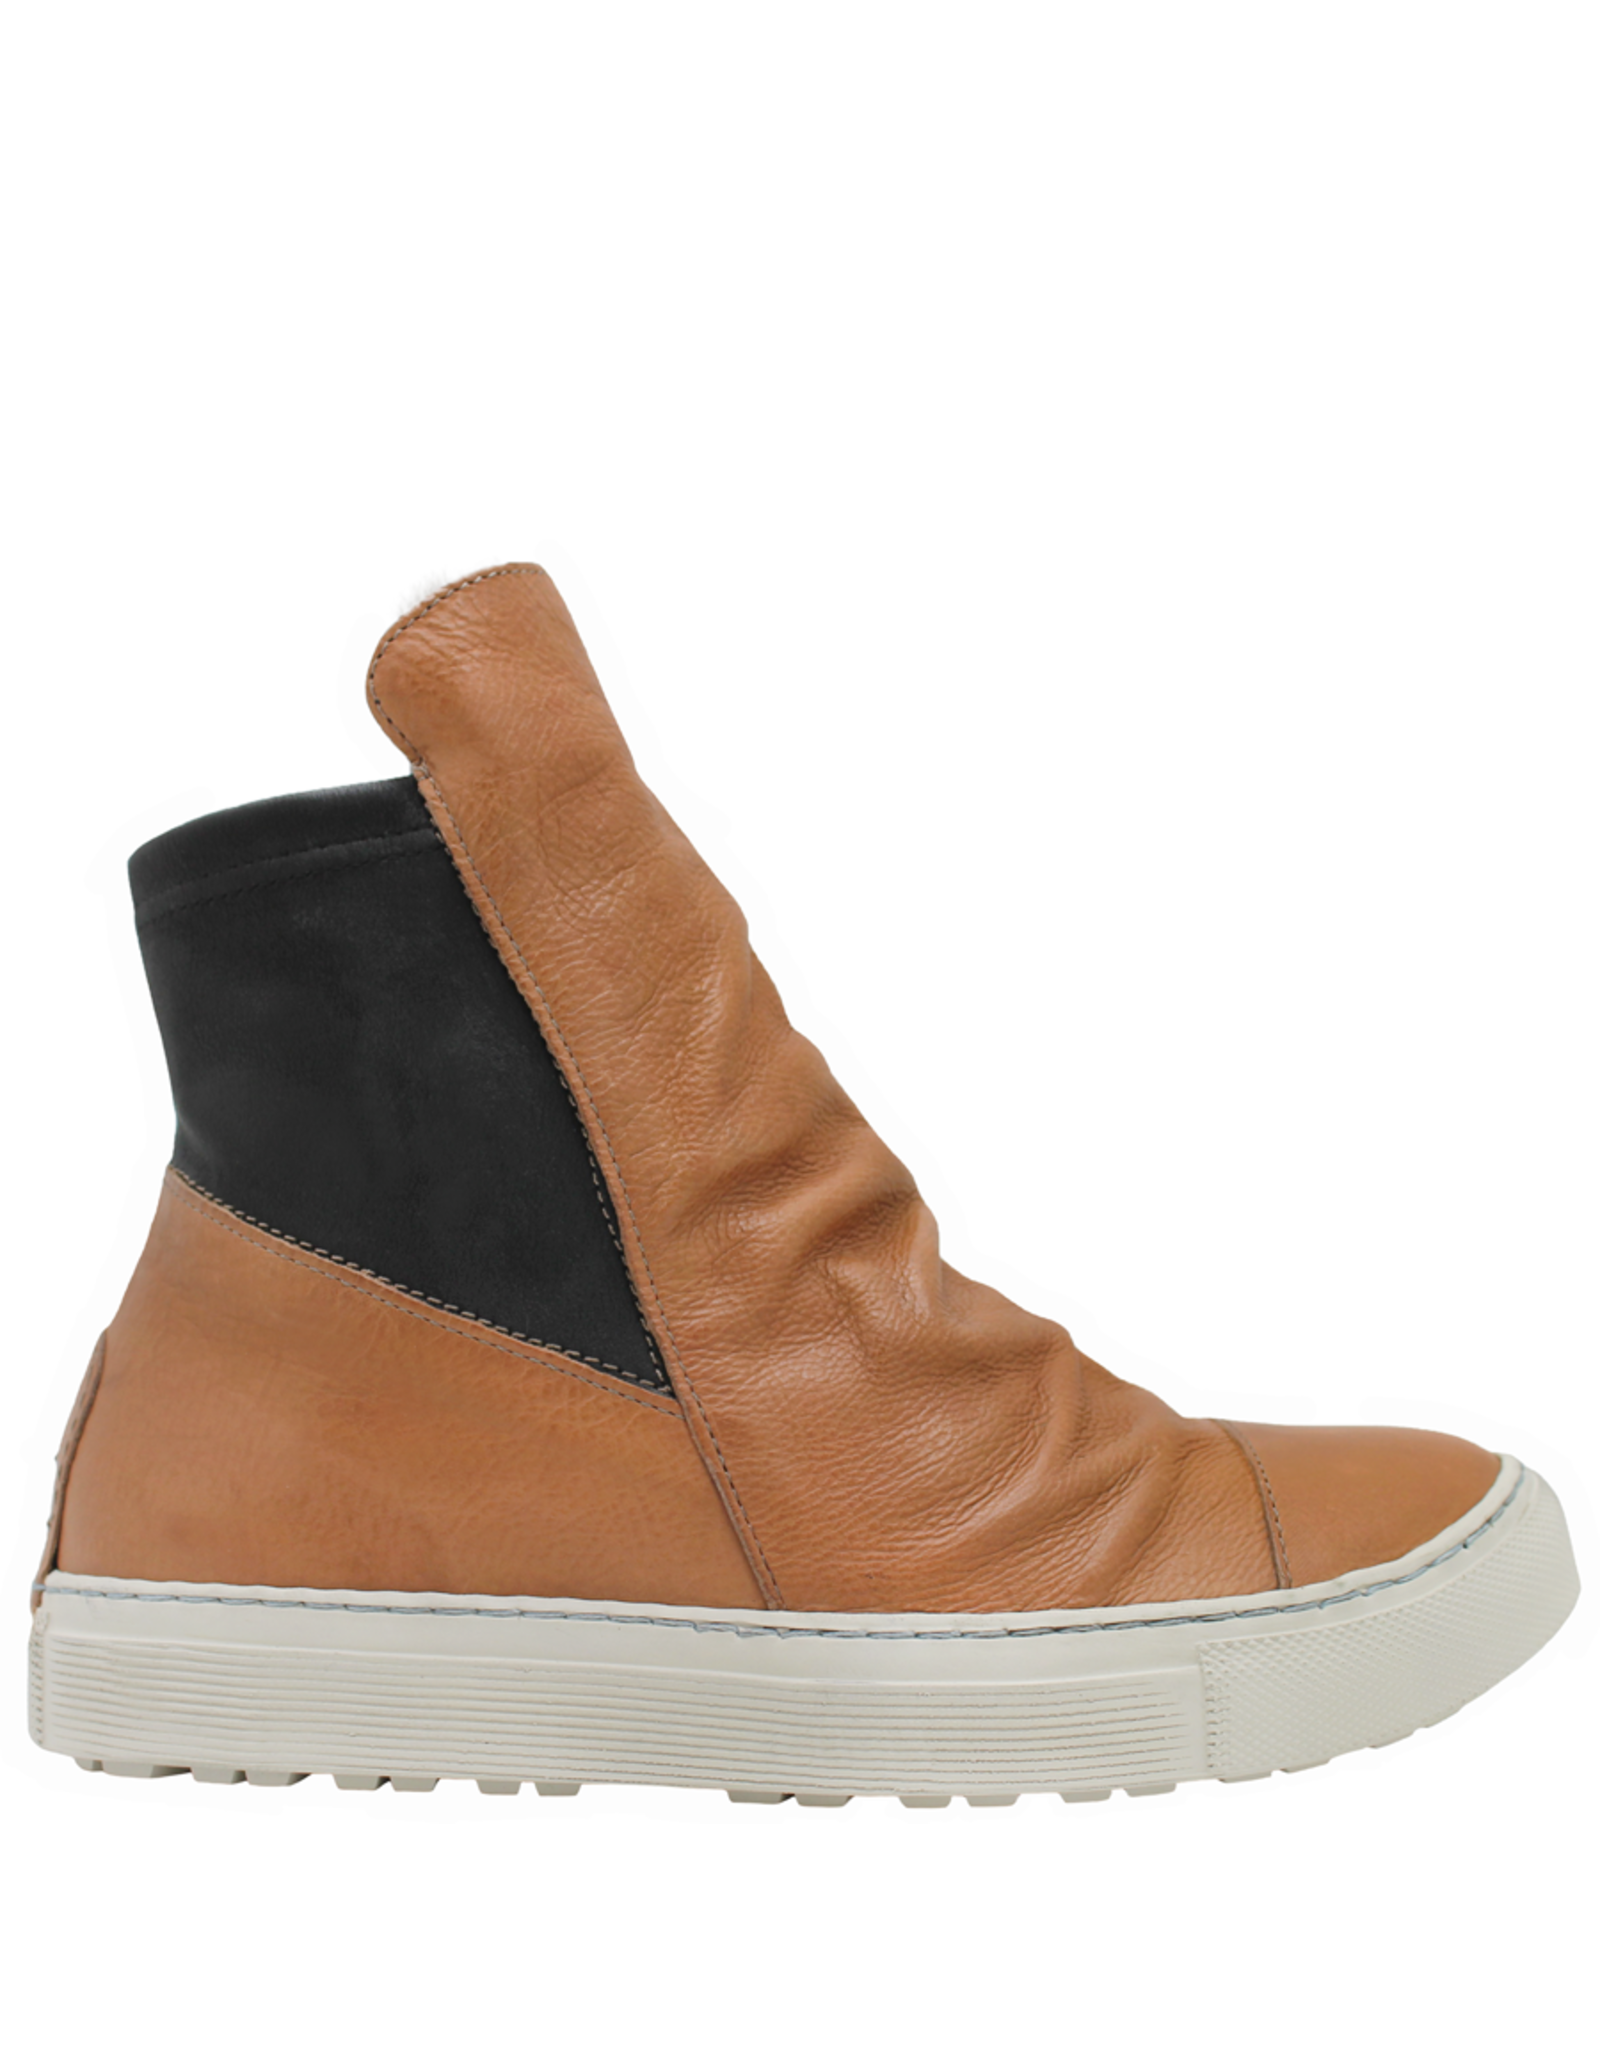 Fiorentini+Baker Fiorentini+Baker Santa-Fe Sneaker with Rabbit Fur Bret-Fur